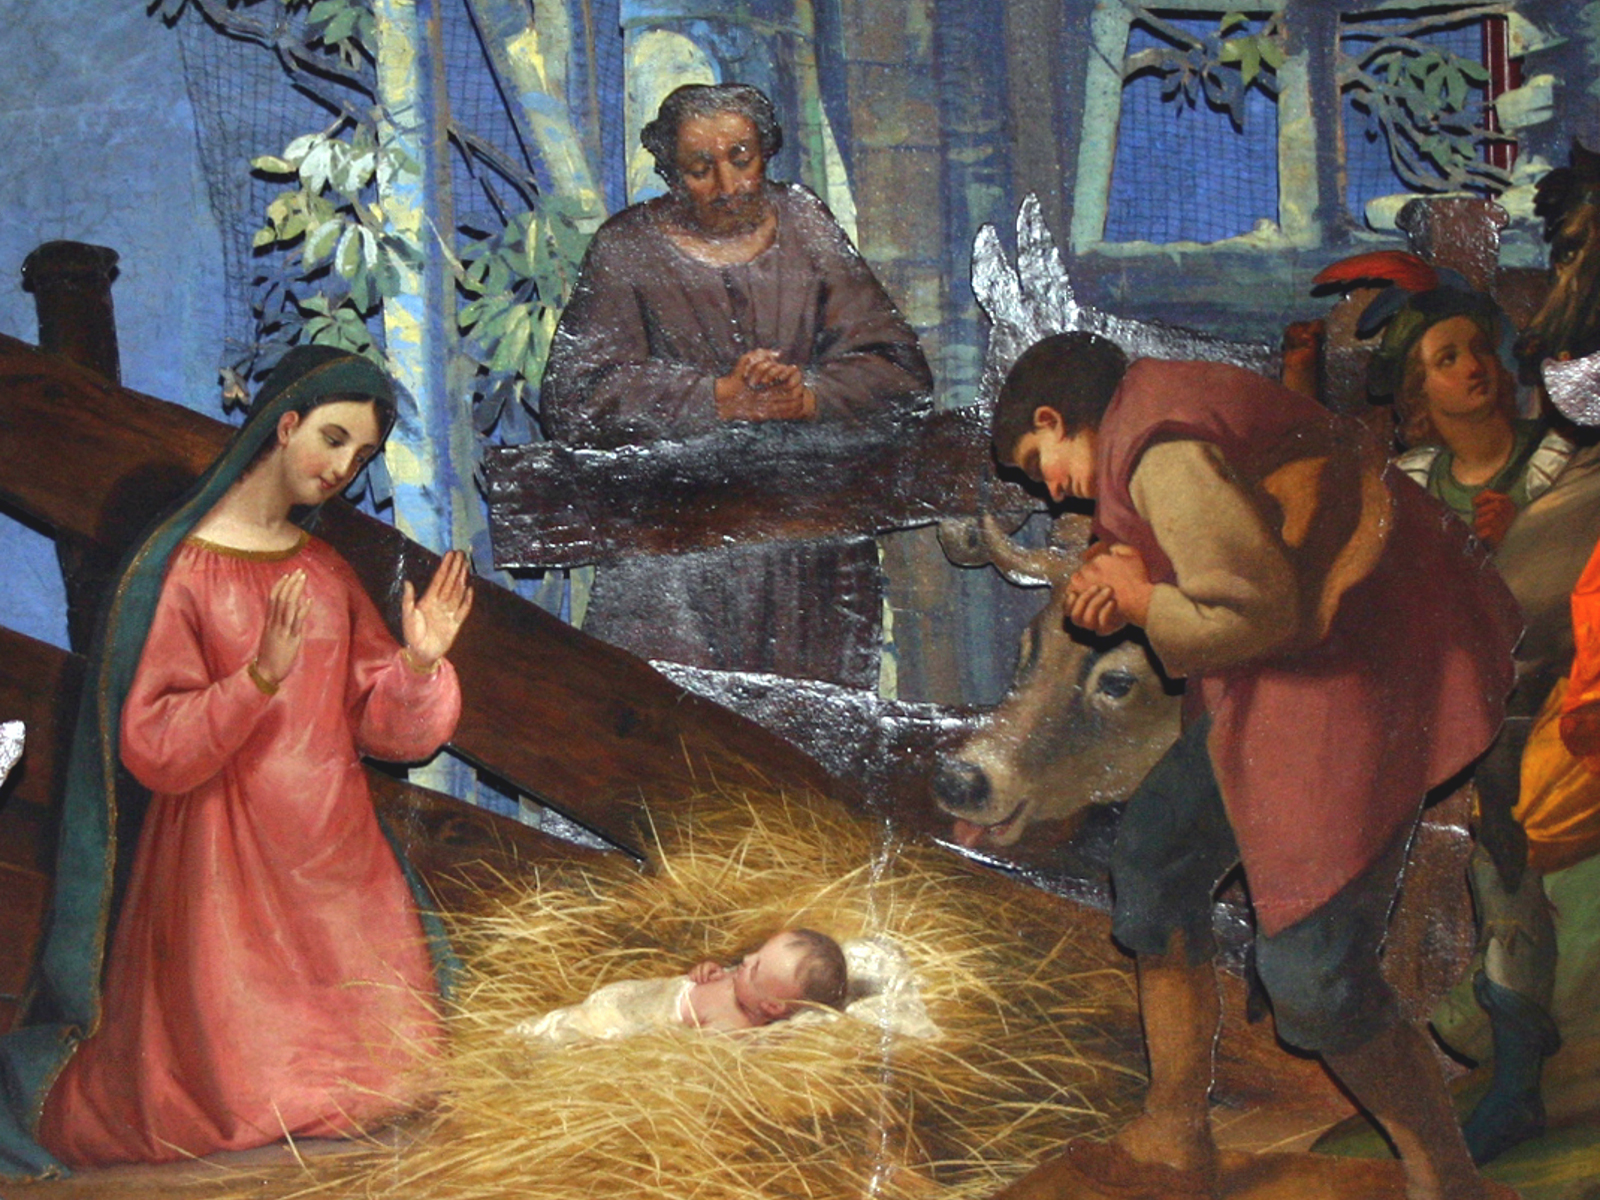 Download Presepe Nativity Wallpaper 1600x1200